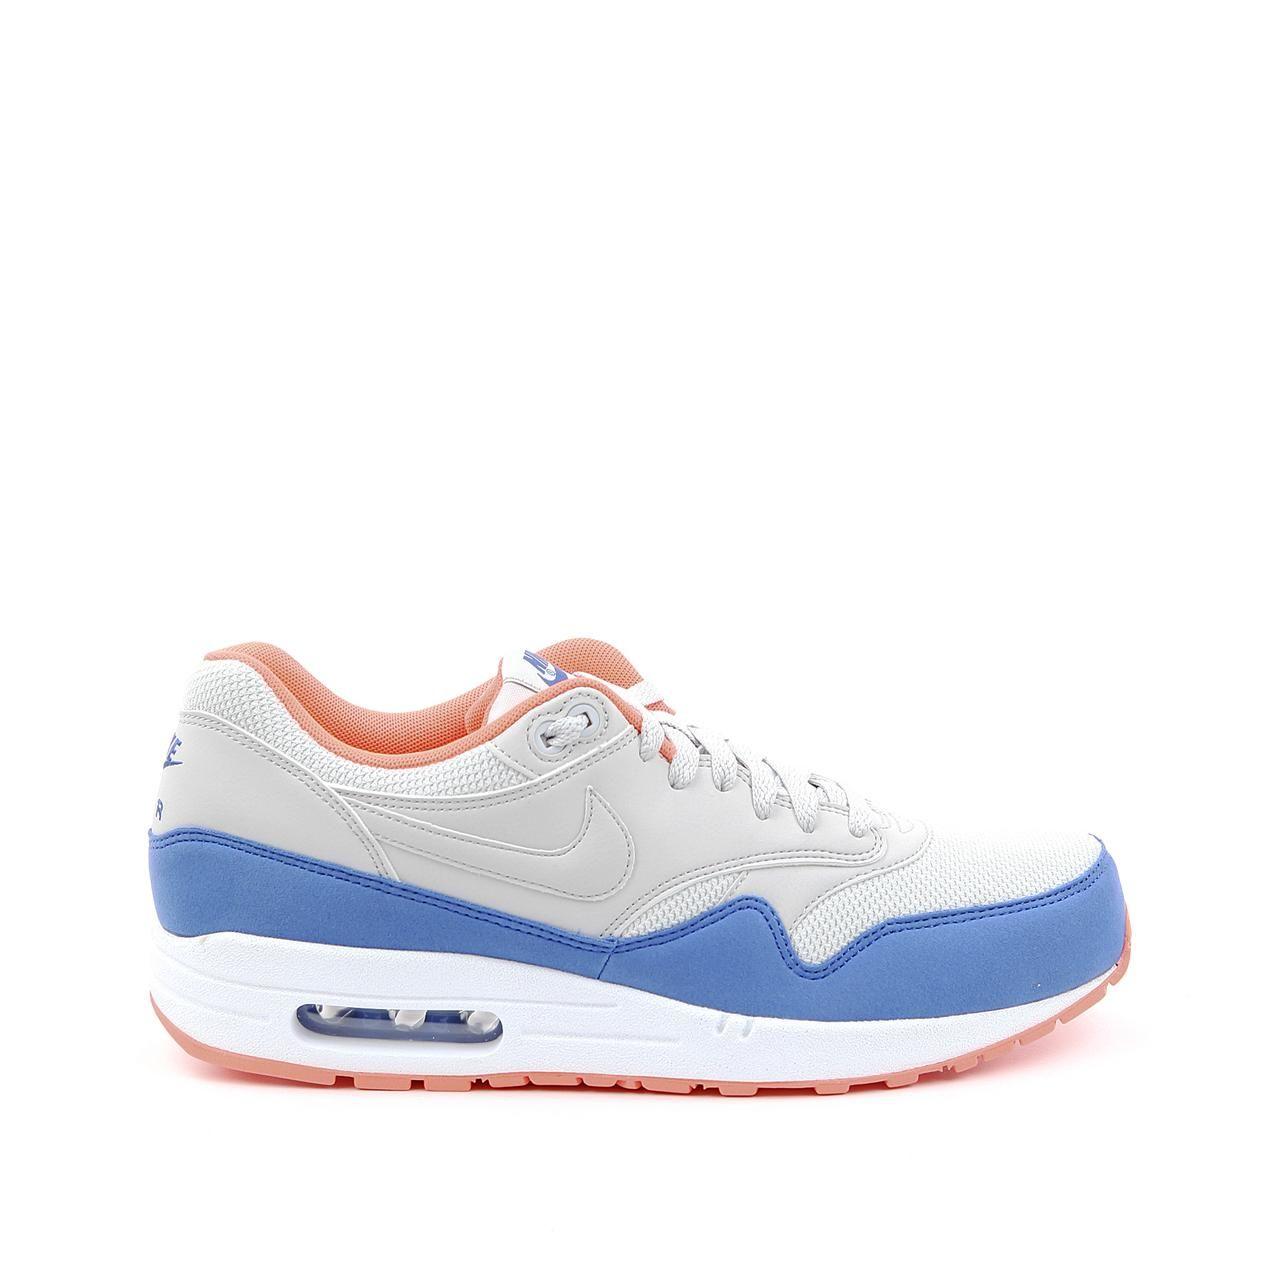 reputable site 8163c b6d07 Nike Air Max 1 Essential online bestellen  Intreza.nl